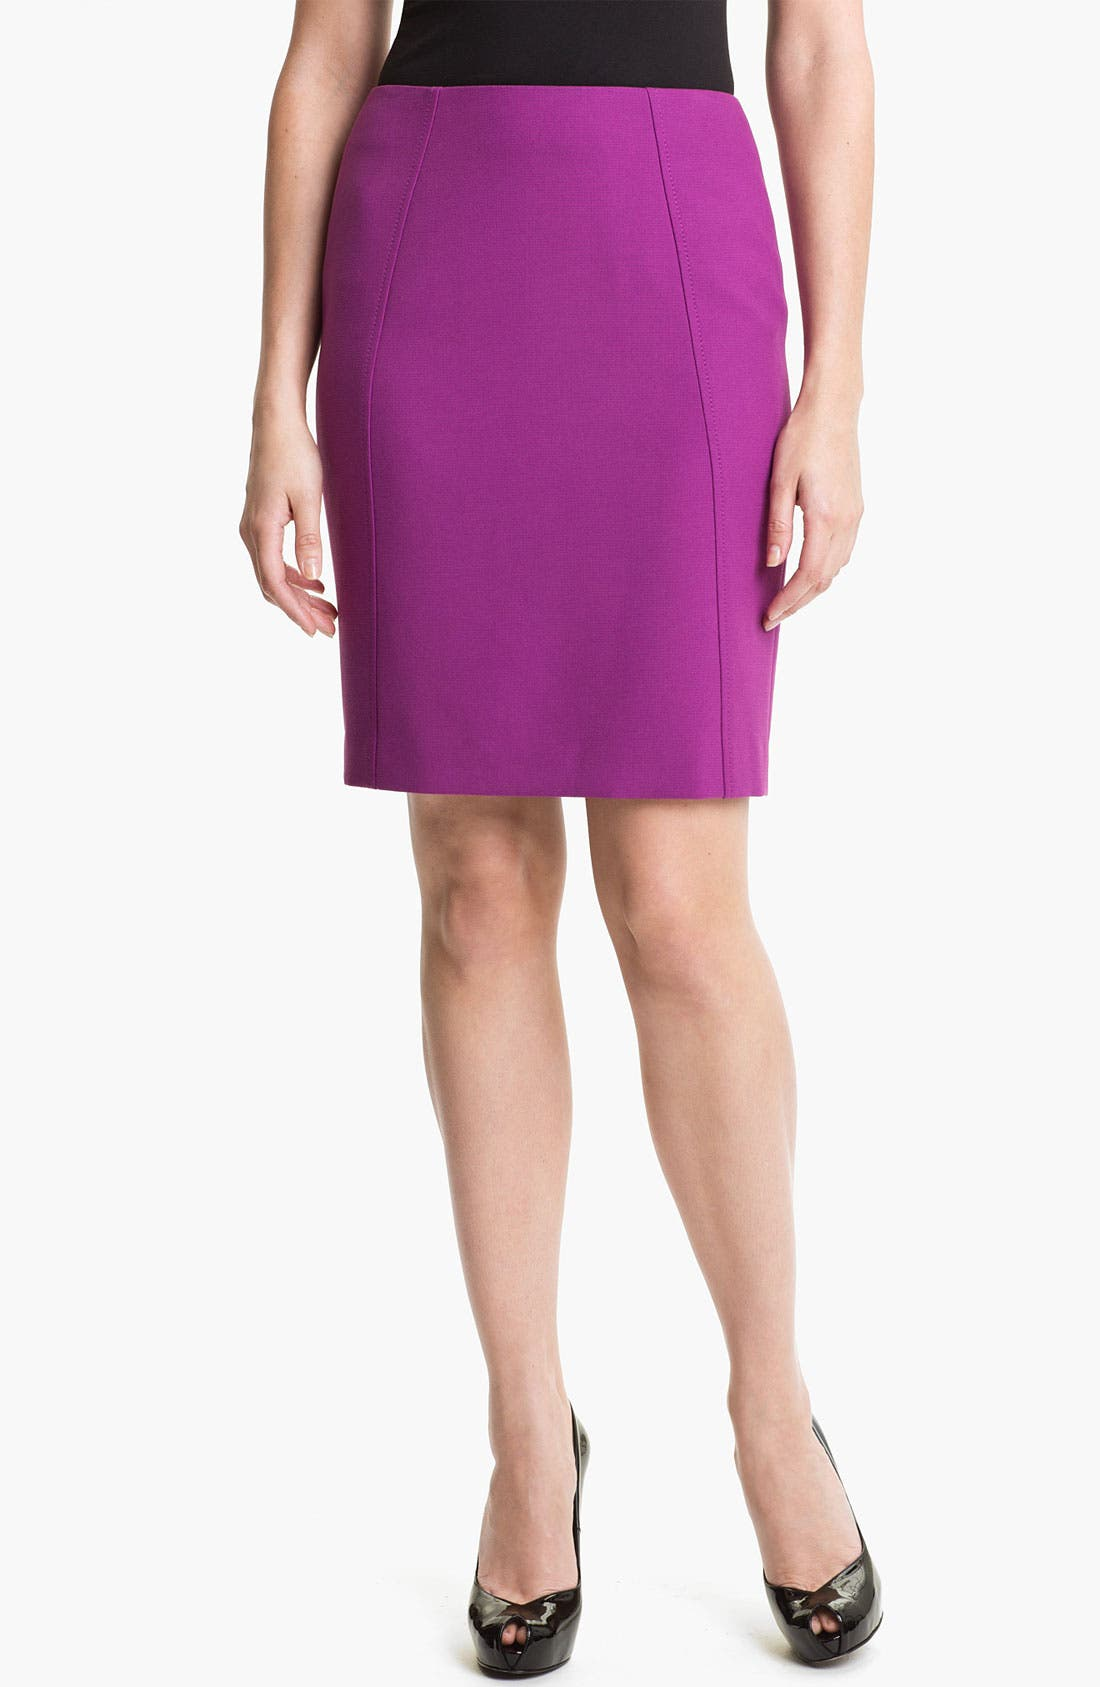 Alternate Image 1 Selected - Halogen® Seamed Pencil Skirt (Petite)